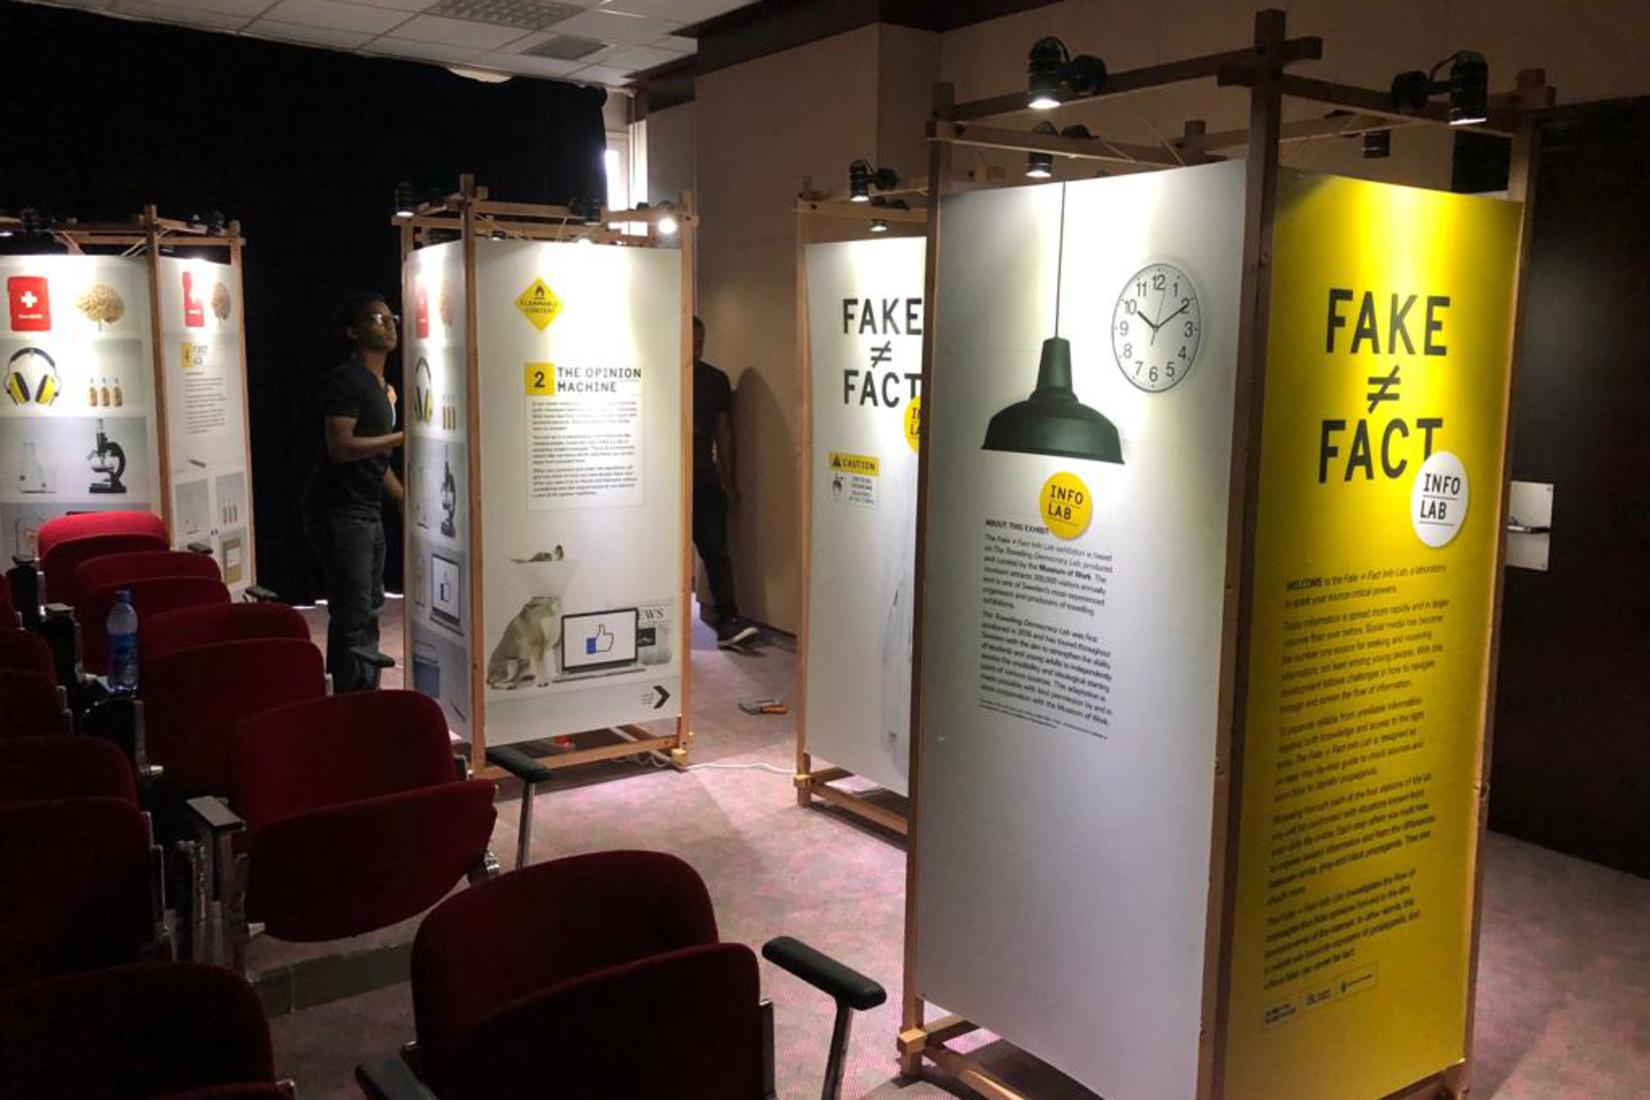 Launching the Fake ≠ Fact Info Lab in Addis Ababa - Svenska institutet